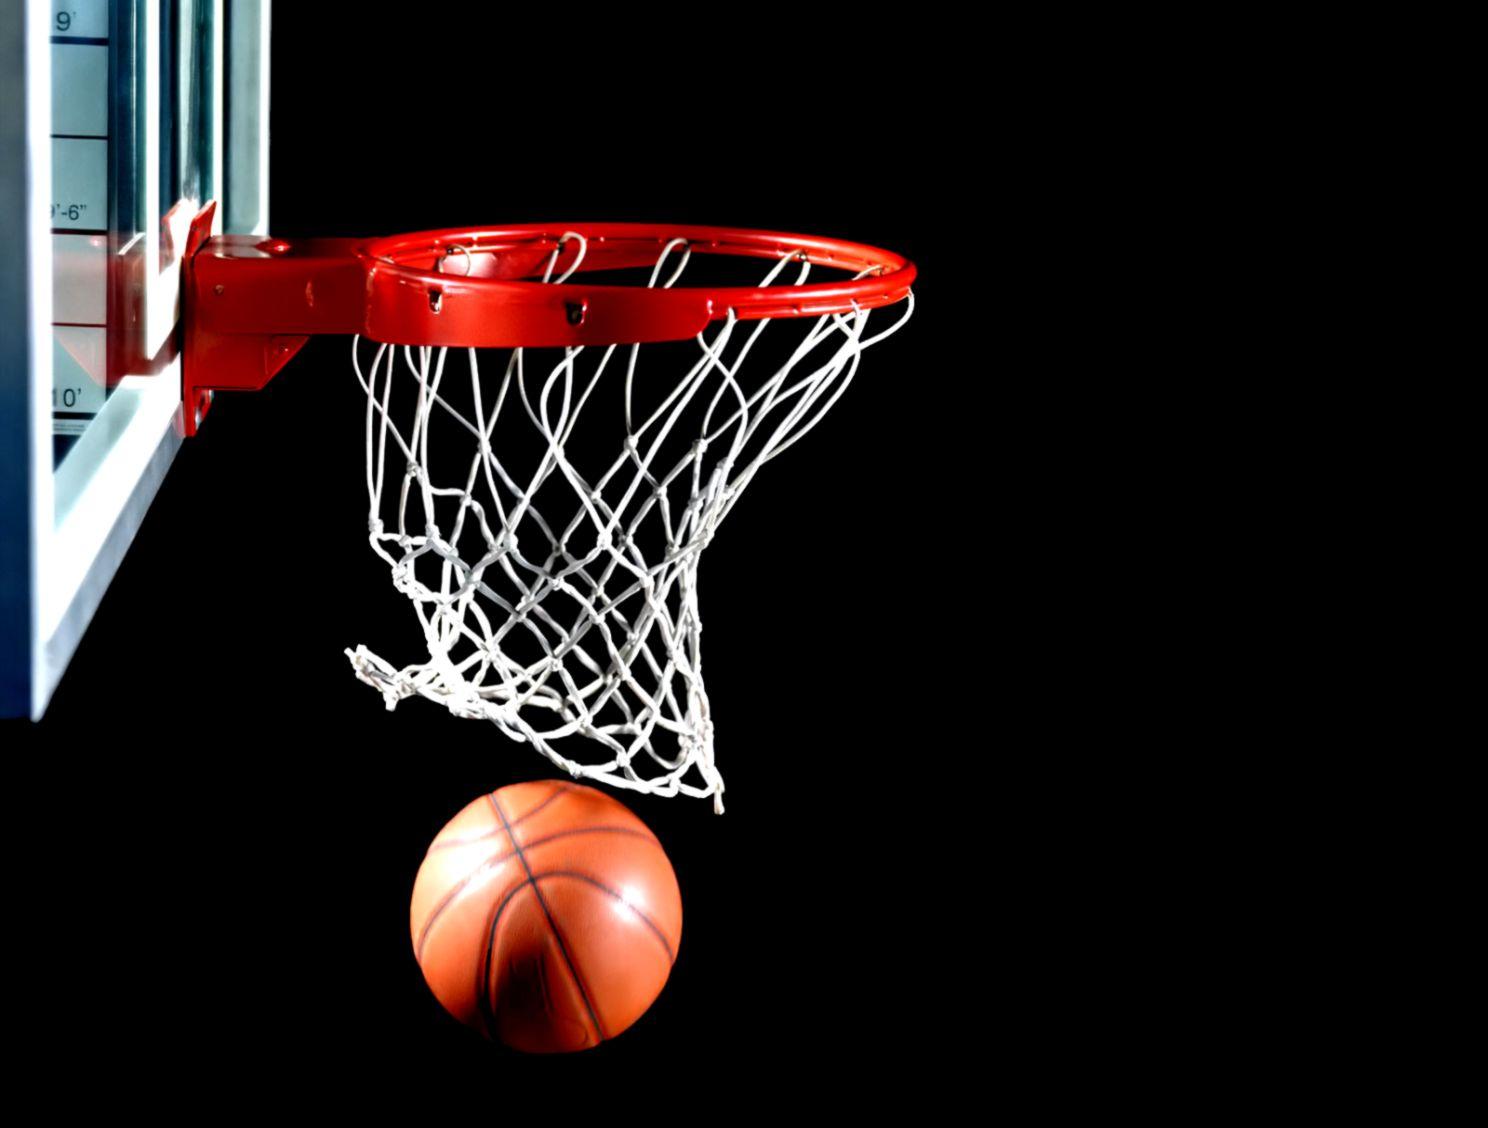 Basketball Wallpaper Background Nba High Definitions Wallpapers